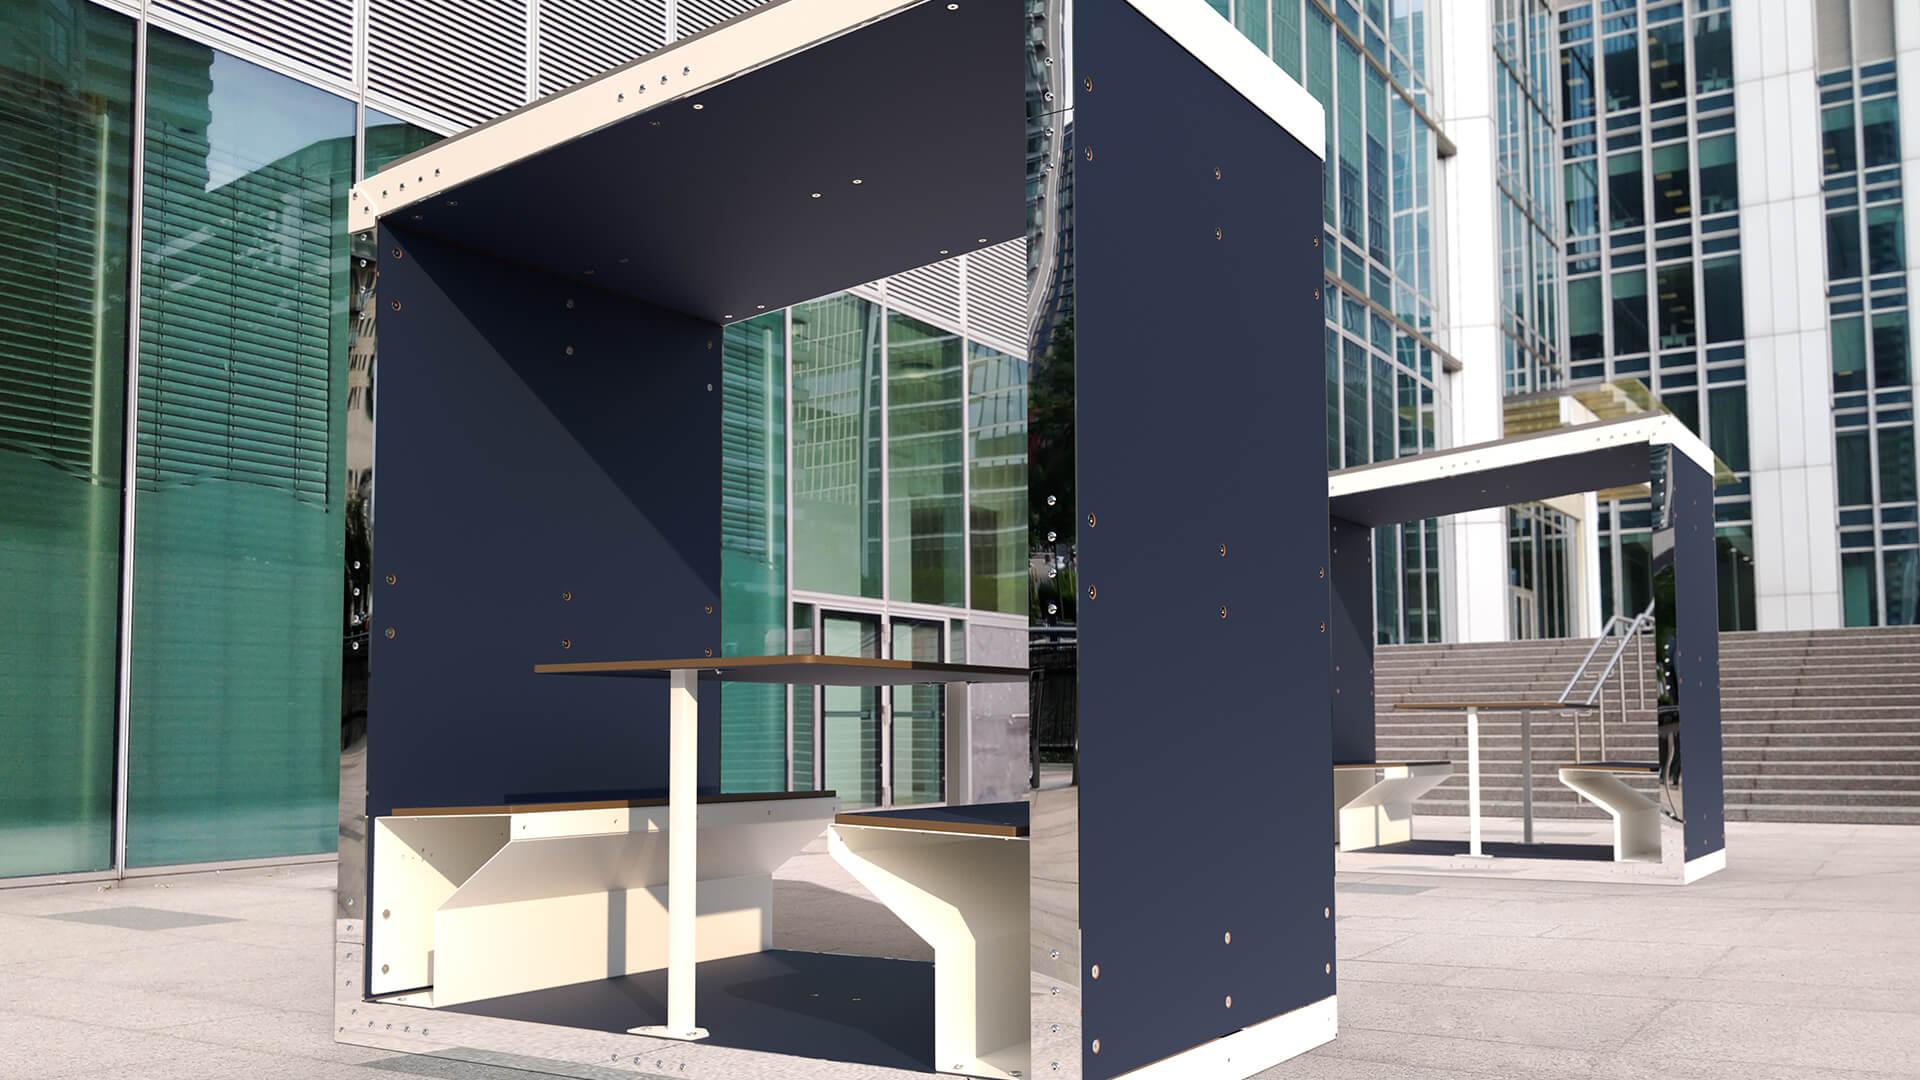 Minka Solar Meeting Pod by Duffy London